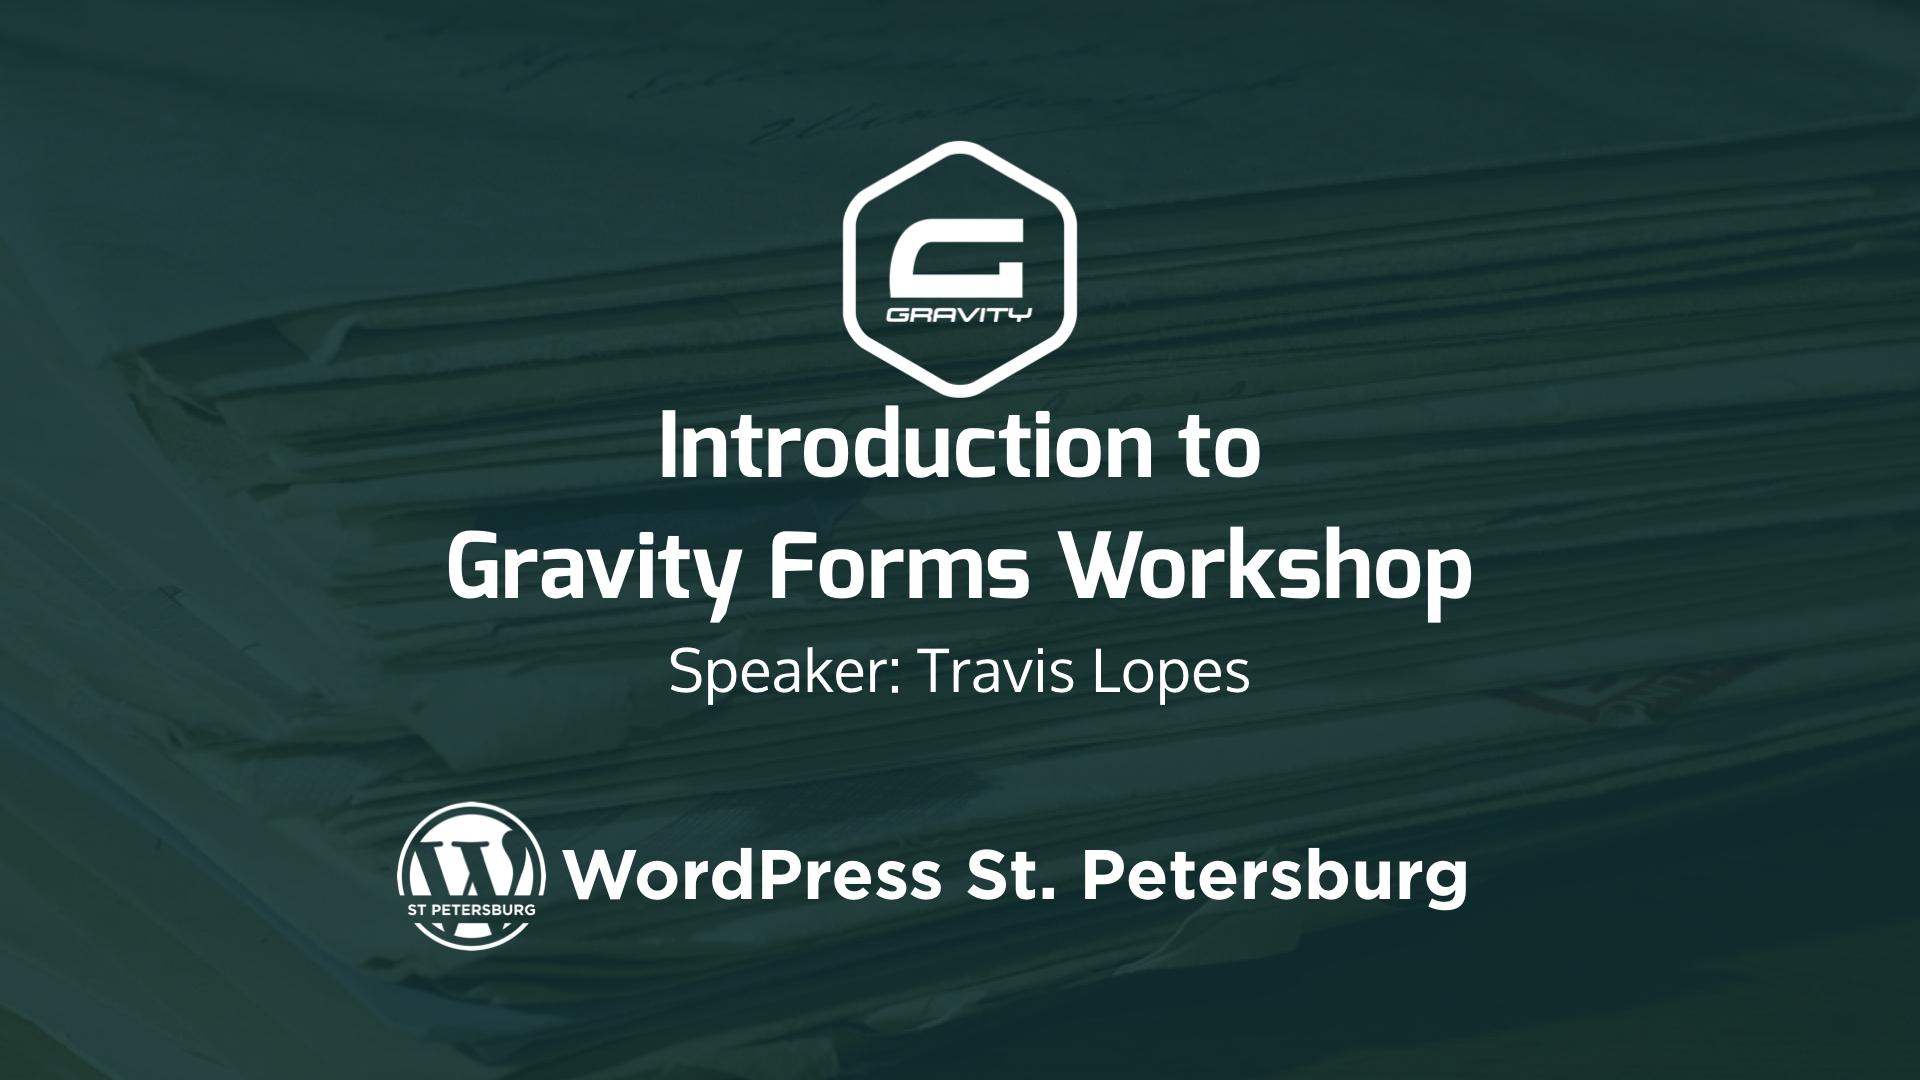 Gravity Forms Workshop